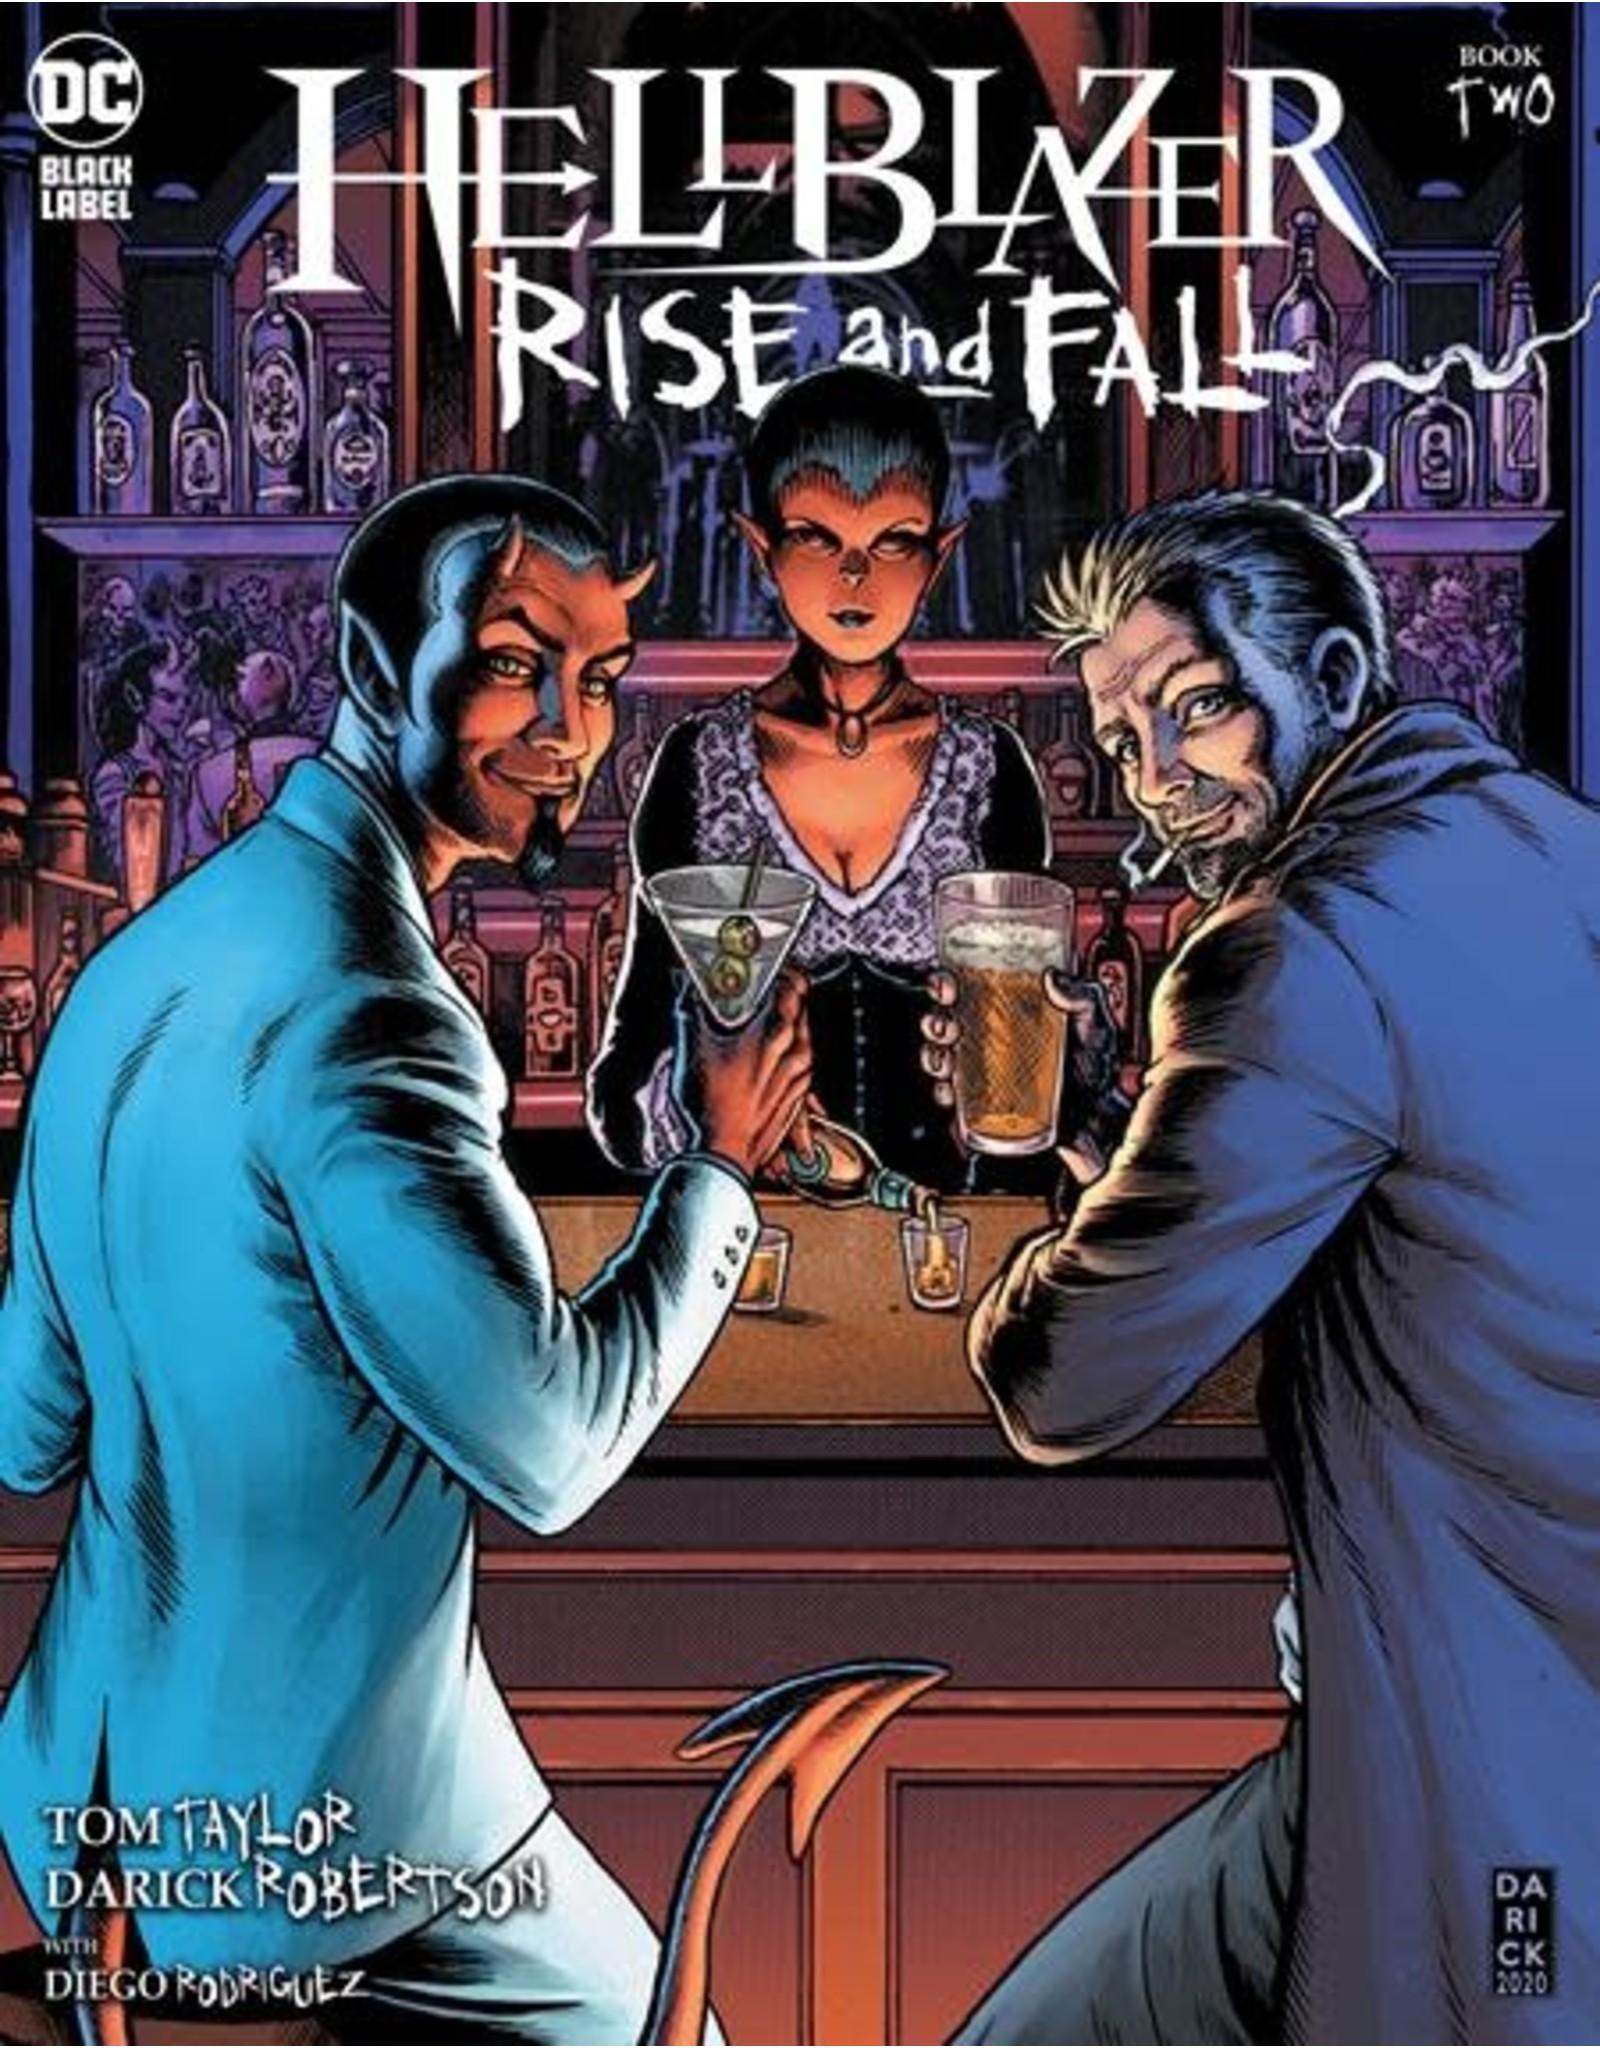 DC Comics HELLBLAZER RISE AND FALL #2 (OF 3) CVR A DARICK ROBERTSON (MR)